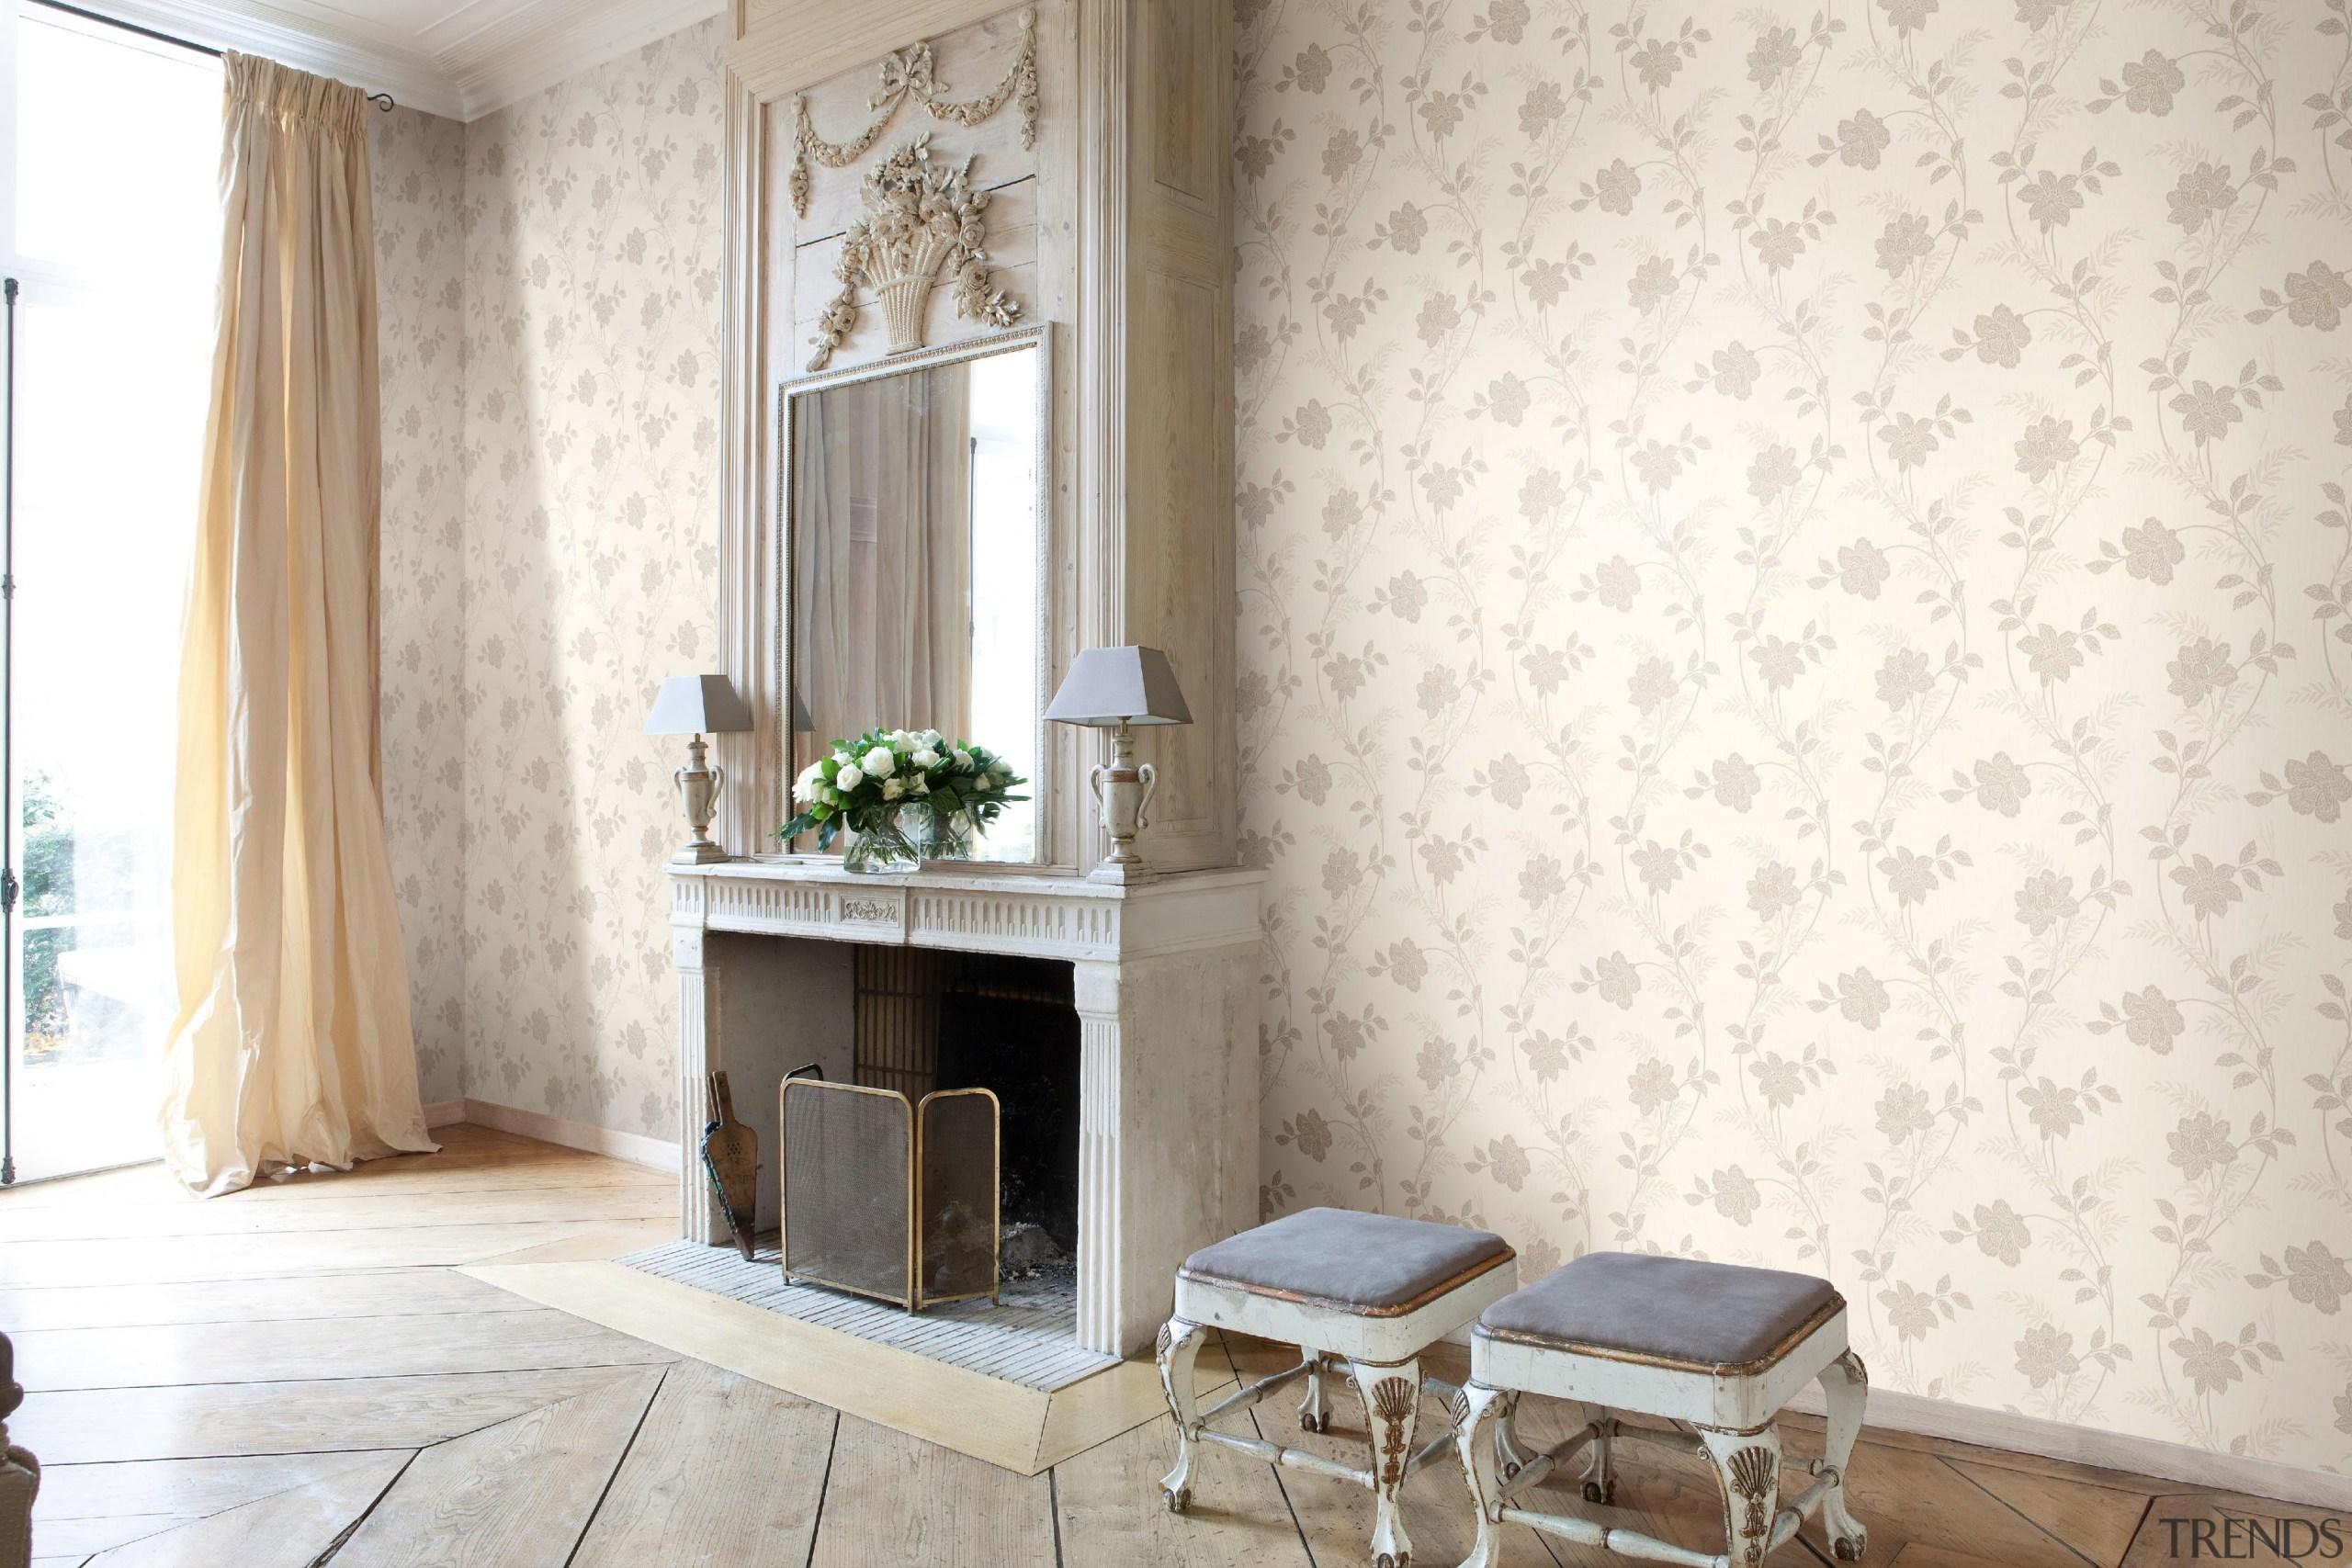 New Belaggio Range - New Belaggio Range - floor, flooring, furniture, home, interior design, living room, property, room, table, tile, wall, window, white